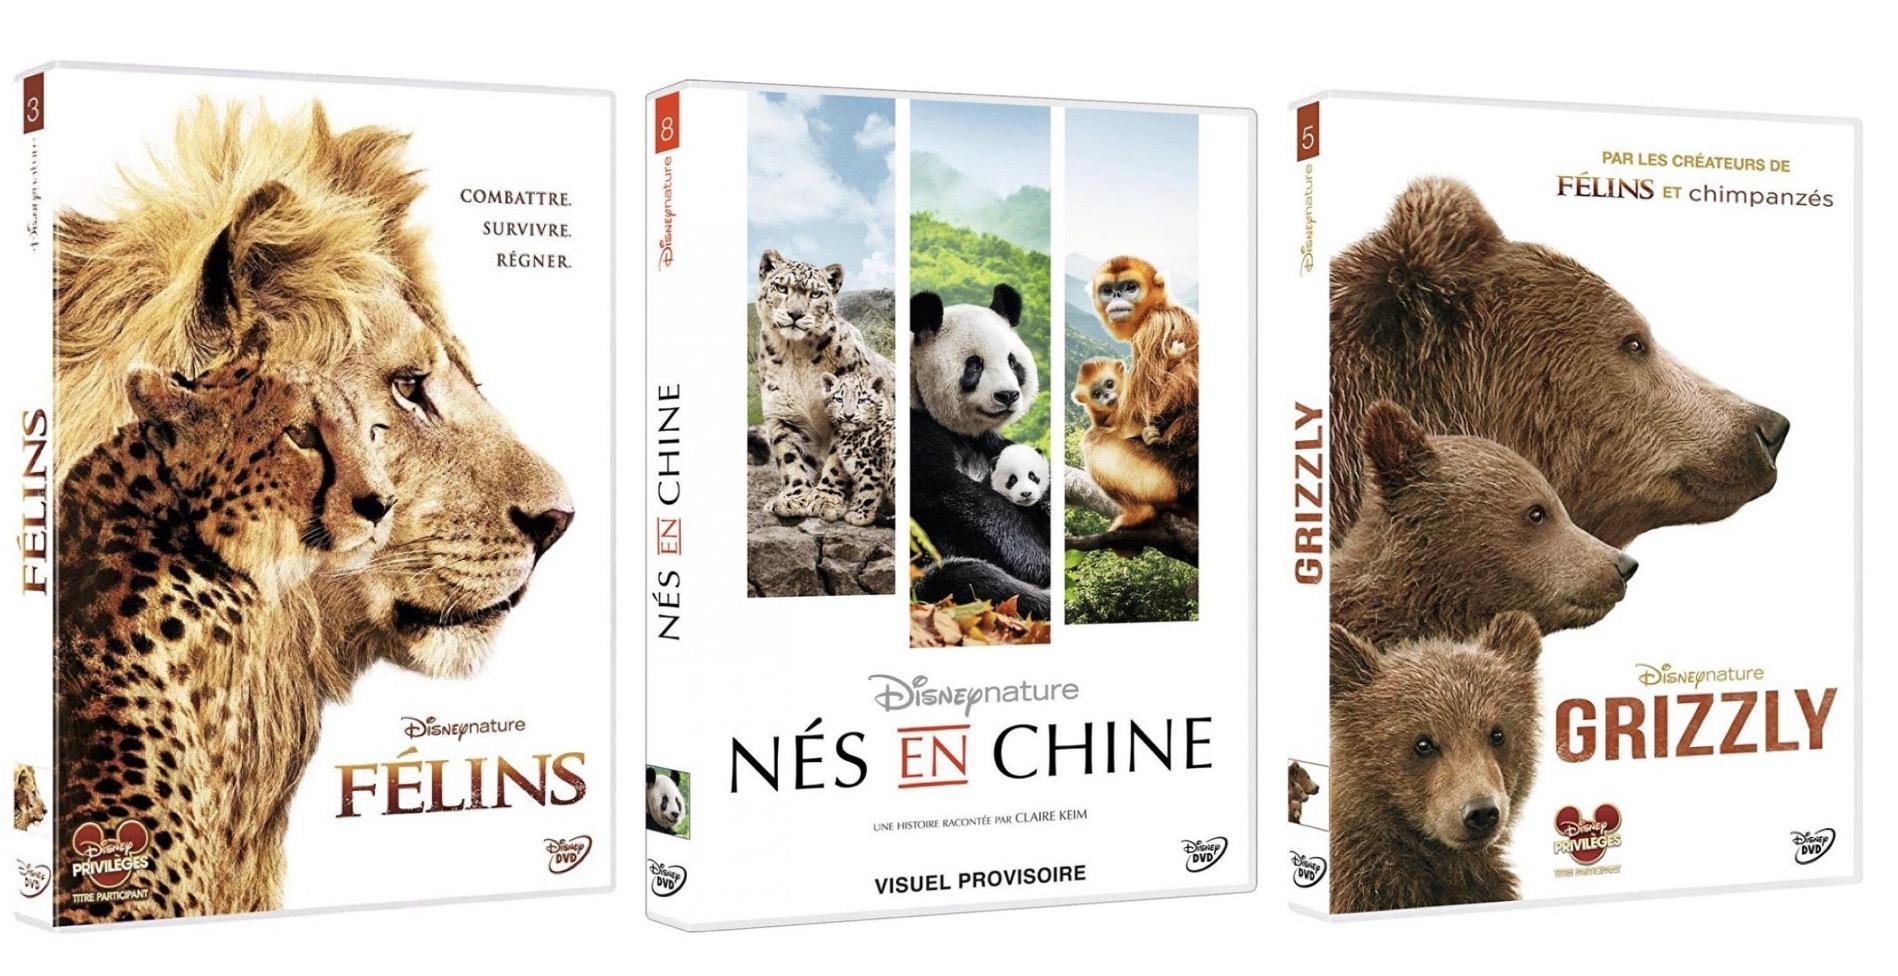 Code promo Amazon : 1 DVD ou Blu-ray Disneynature acheté = 1 offert